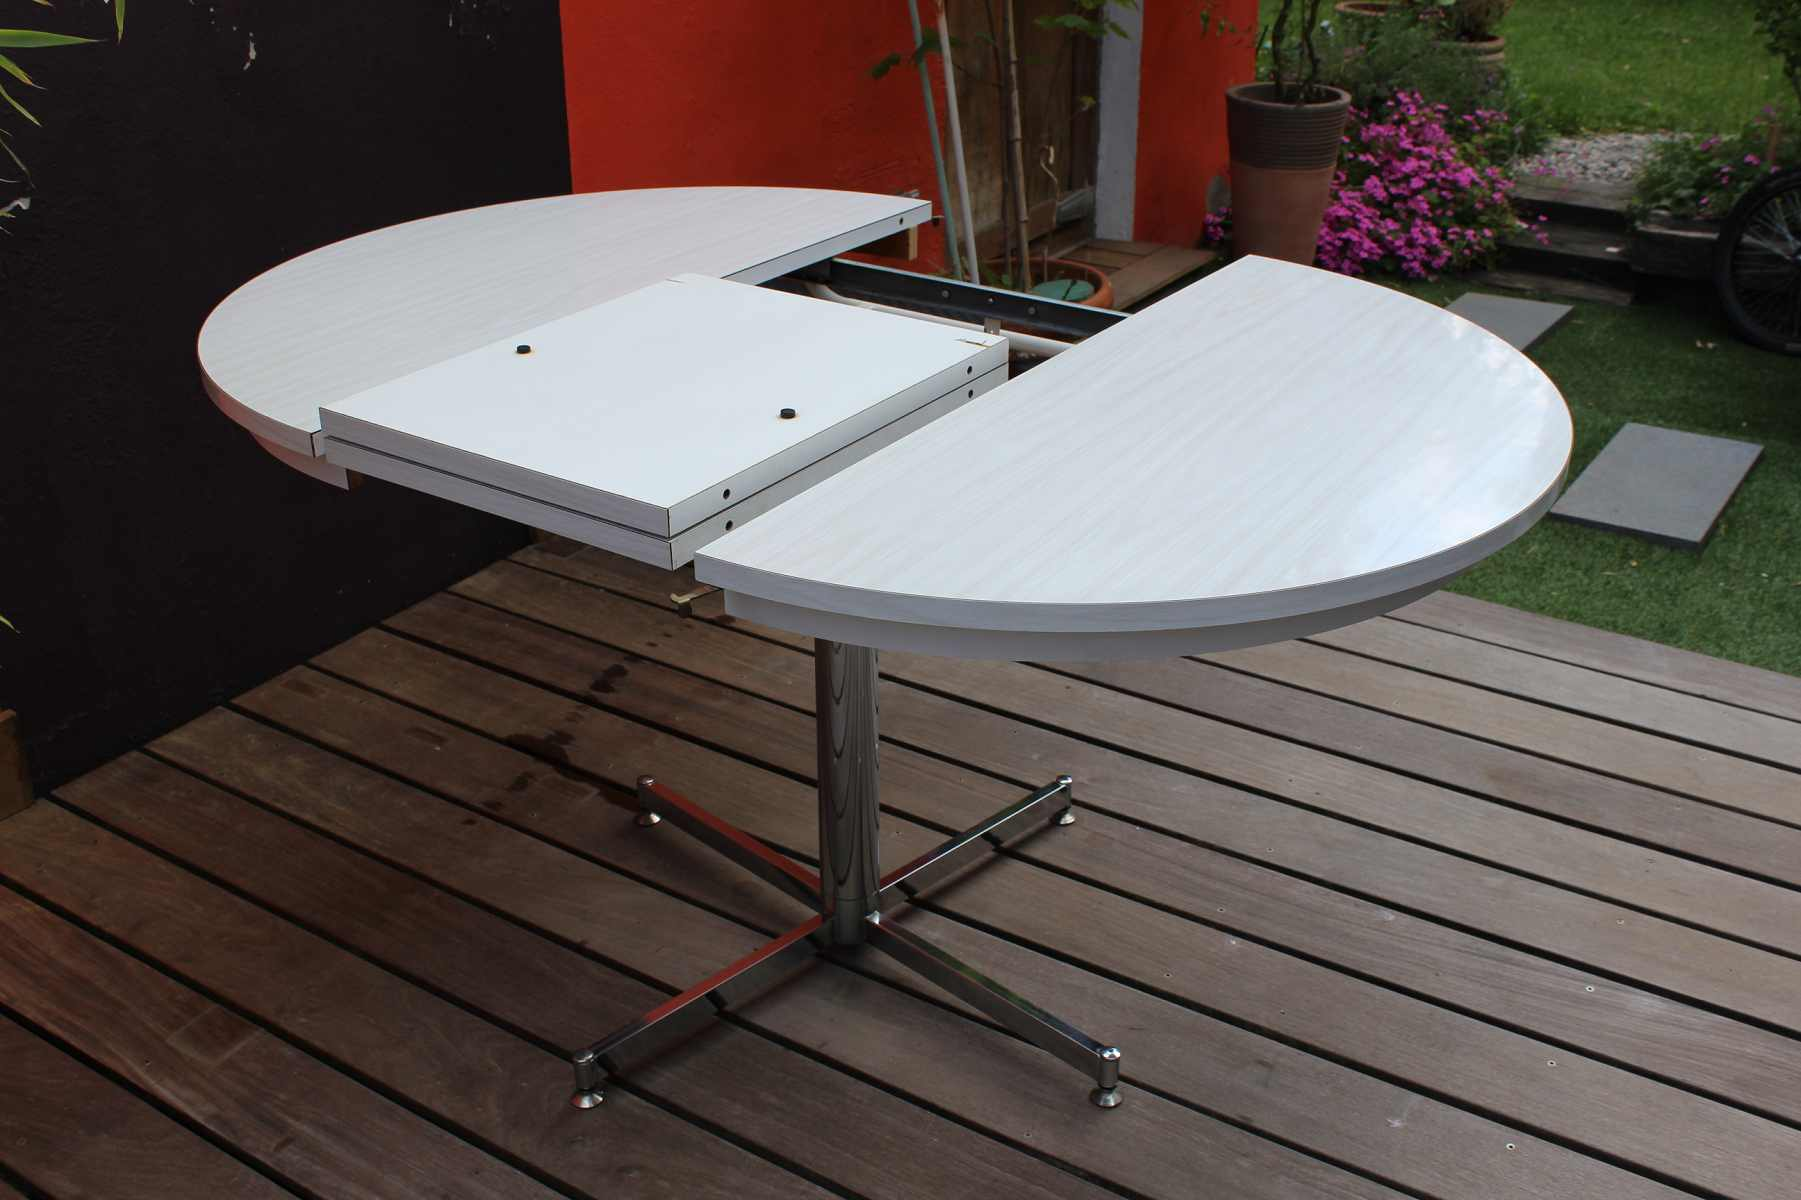 Table formica en version ronde ou ovale vintage by fabichka - Table basse ronde ou ovale ...